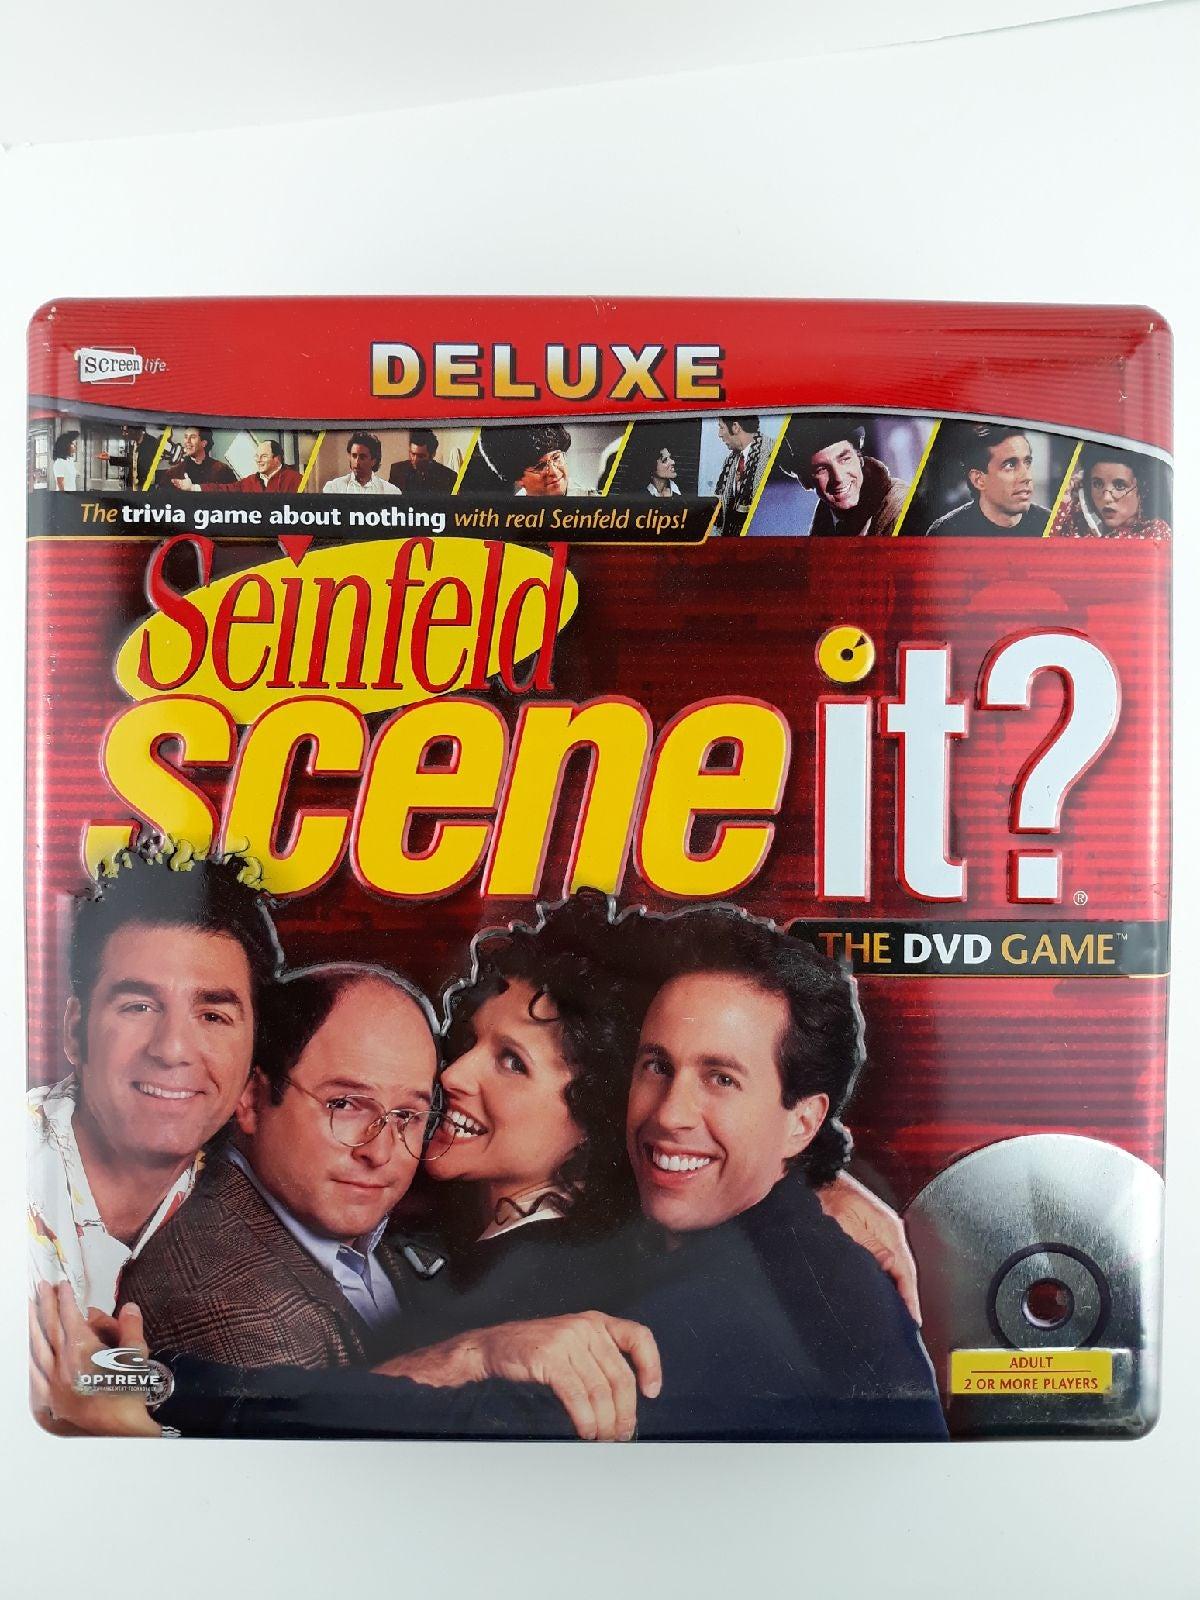 Seinfeld Scene It? The DVD Game